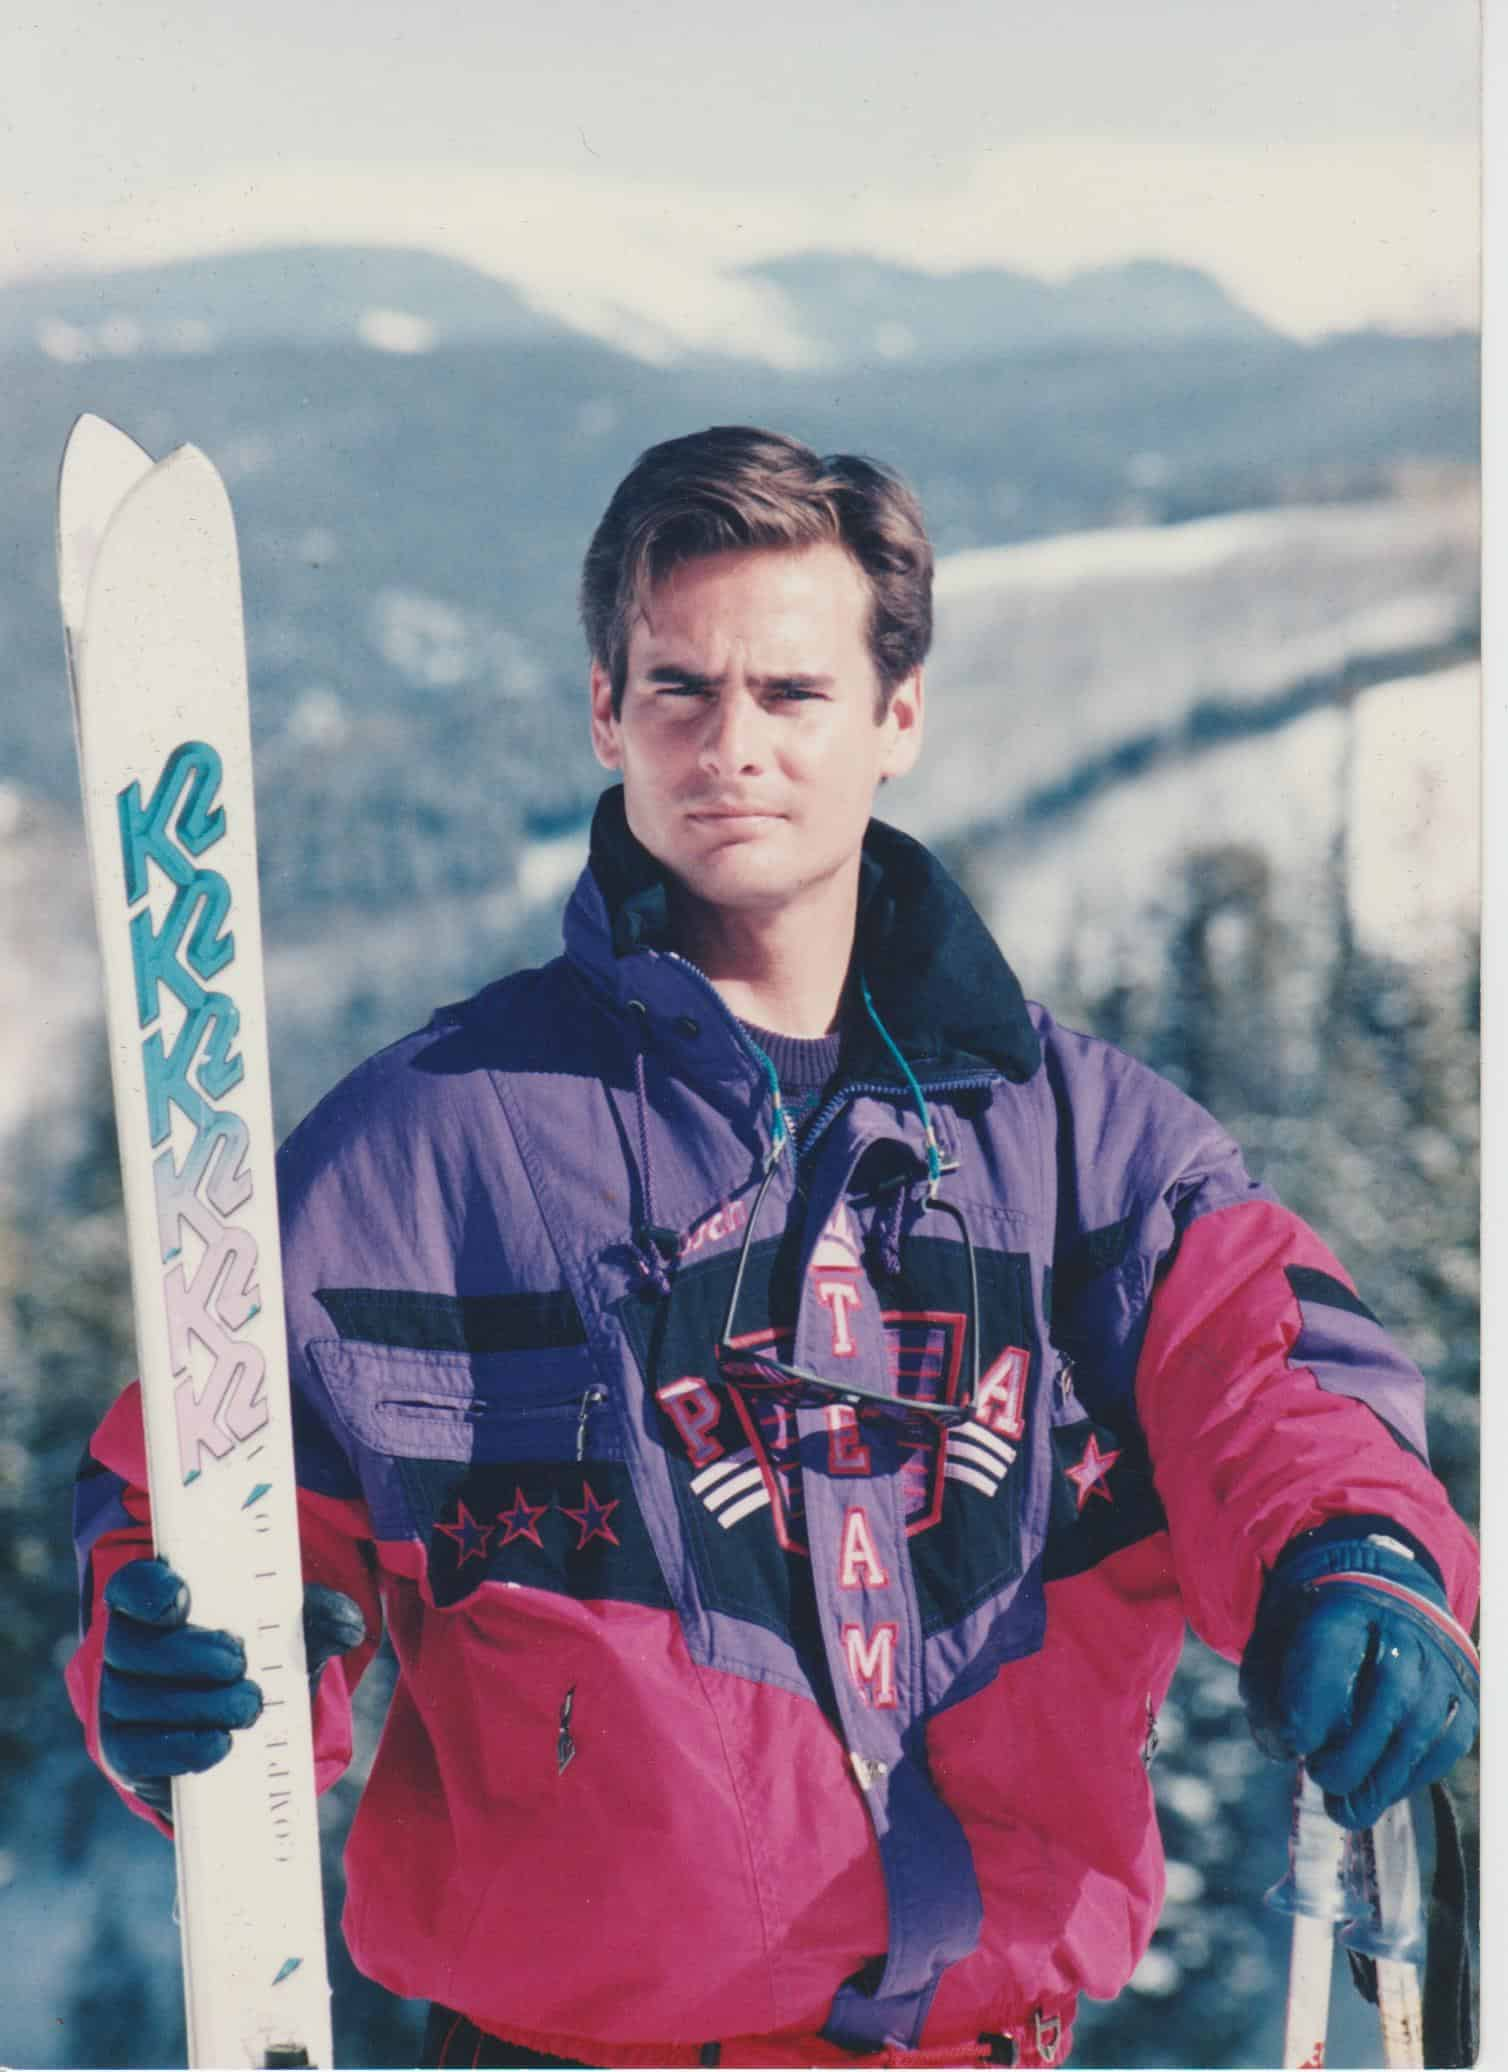 dennis lox m.d. skiing